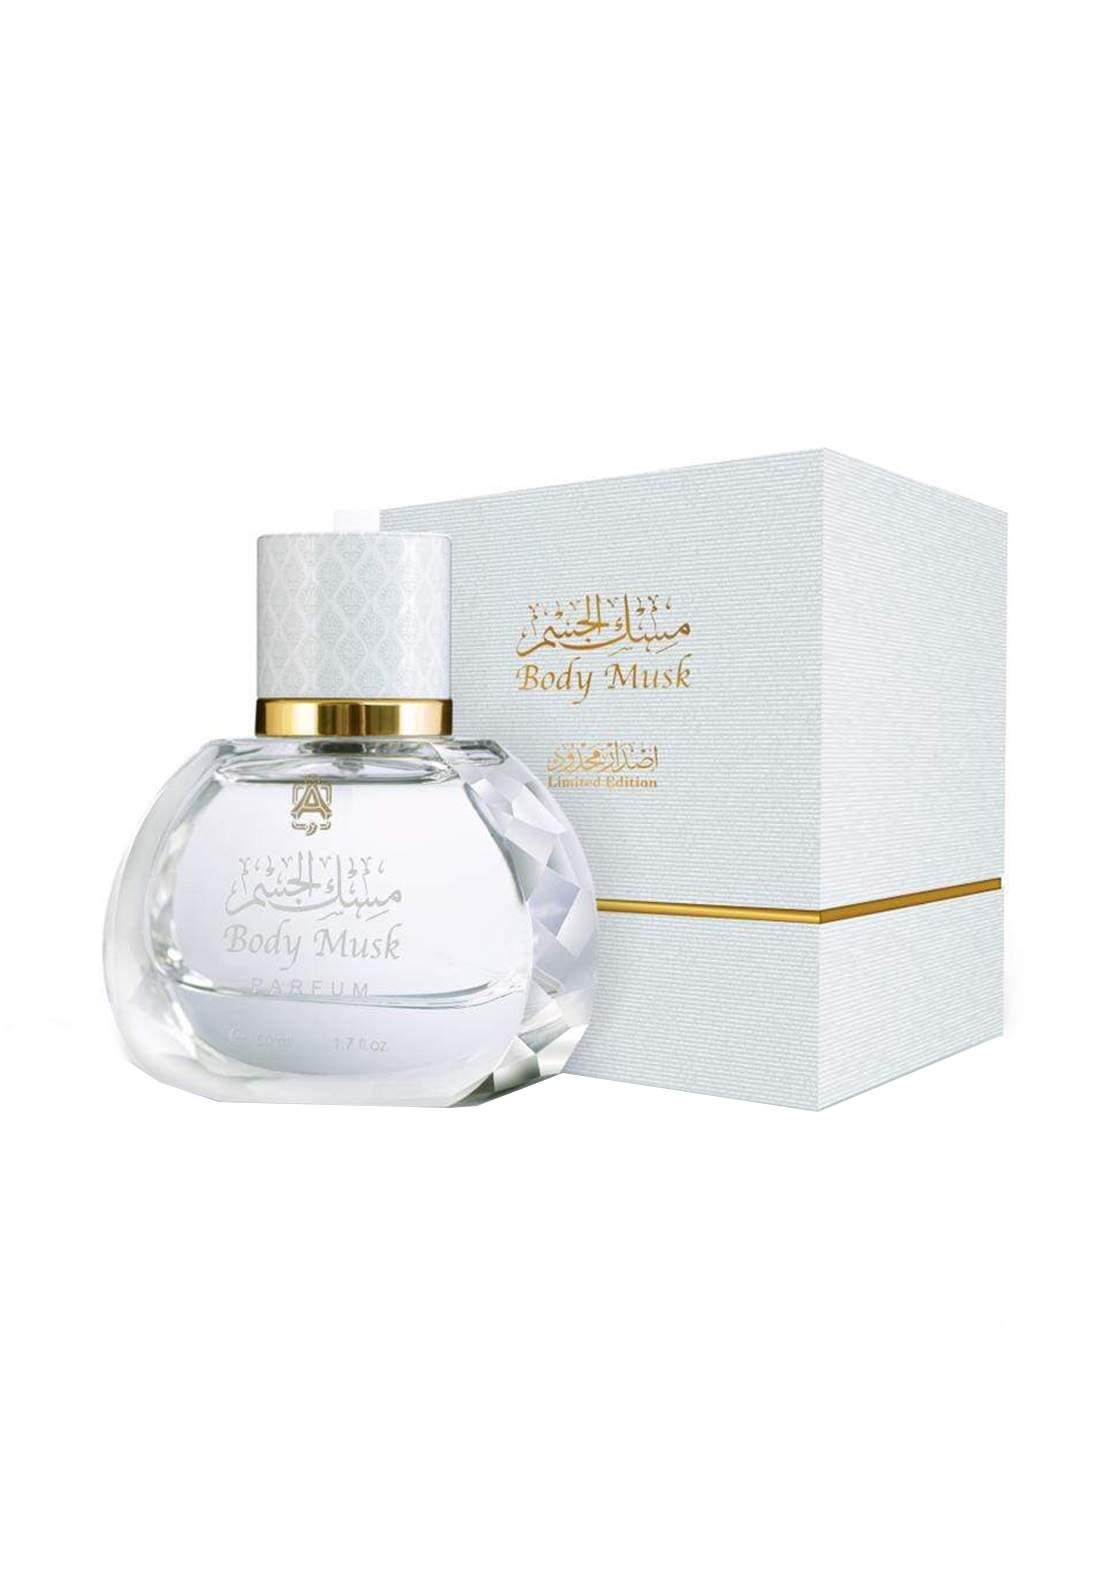 Abdul Samad Al Qurashi 71121 Asq Body Musk - Limited Edition 30ml مسك الجسم